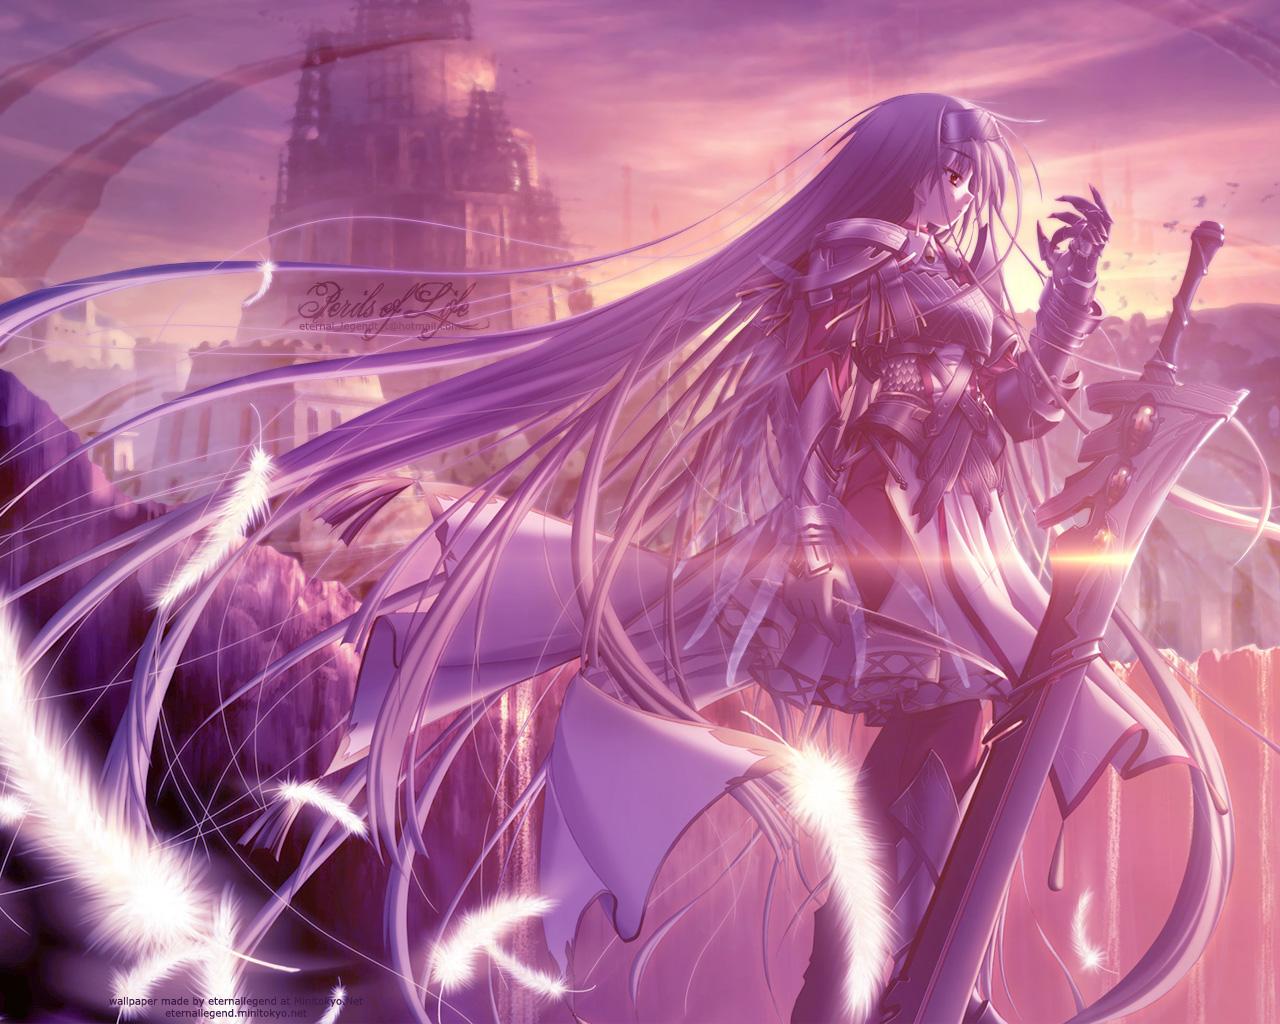 Blade wielding girl anime wallpaper pack randomness thing - Girl with sword wallpaper ...